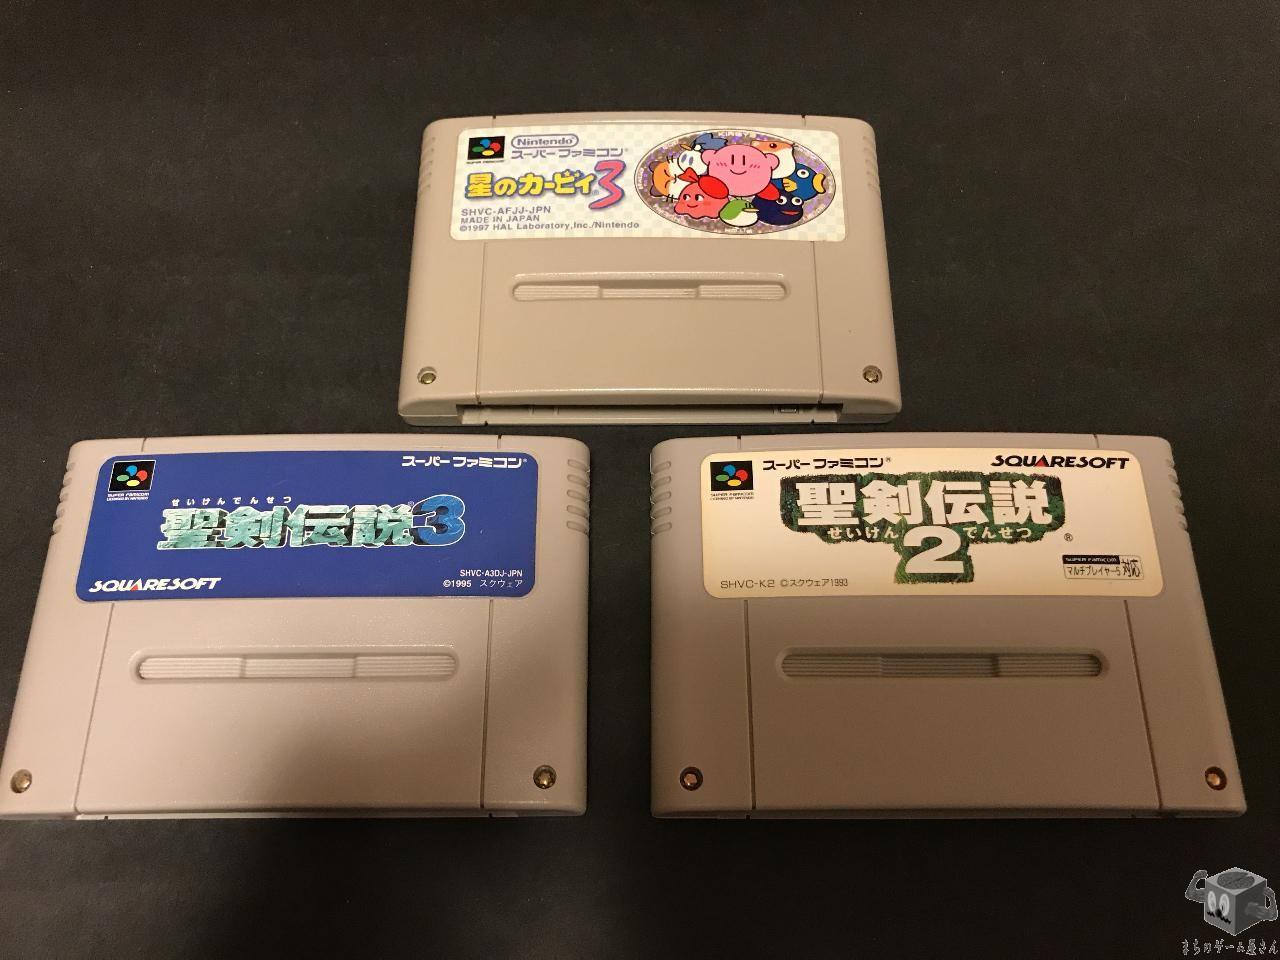 [SFC] Seiken Densetsu 2 & 3 /Secret of Mana , Kirby's Dream Land 3